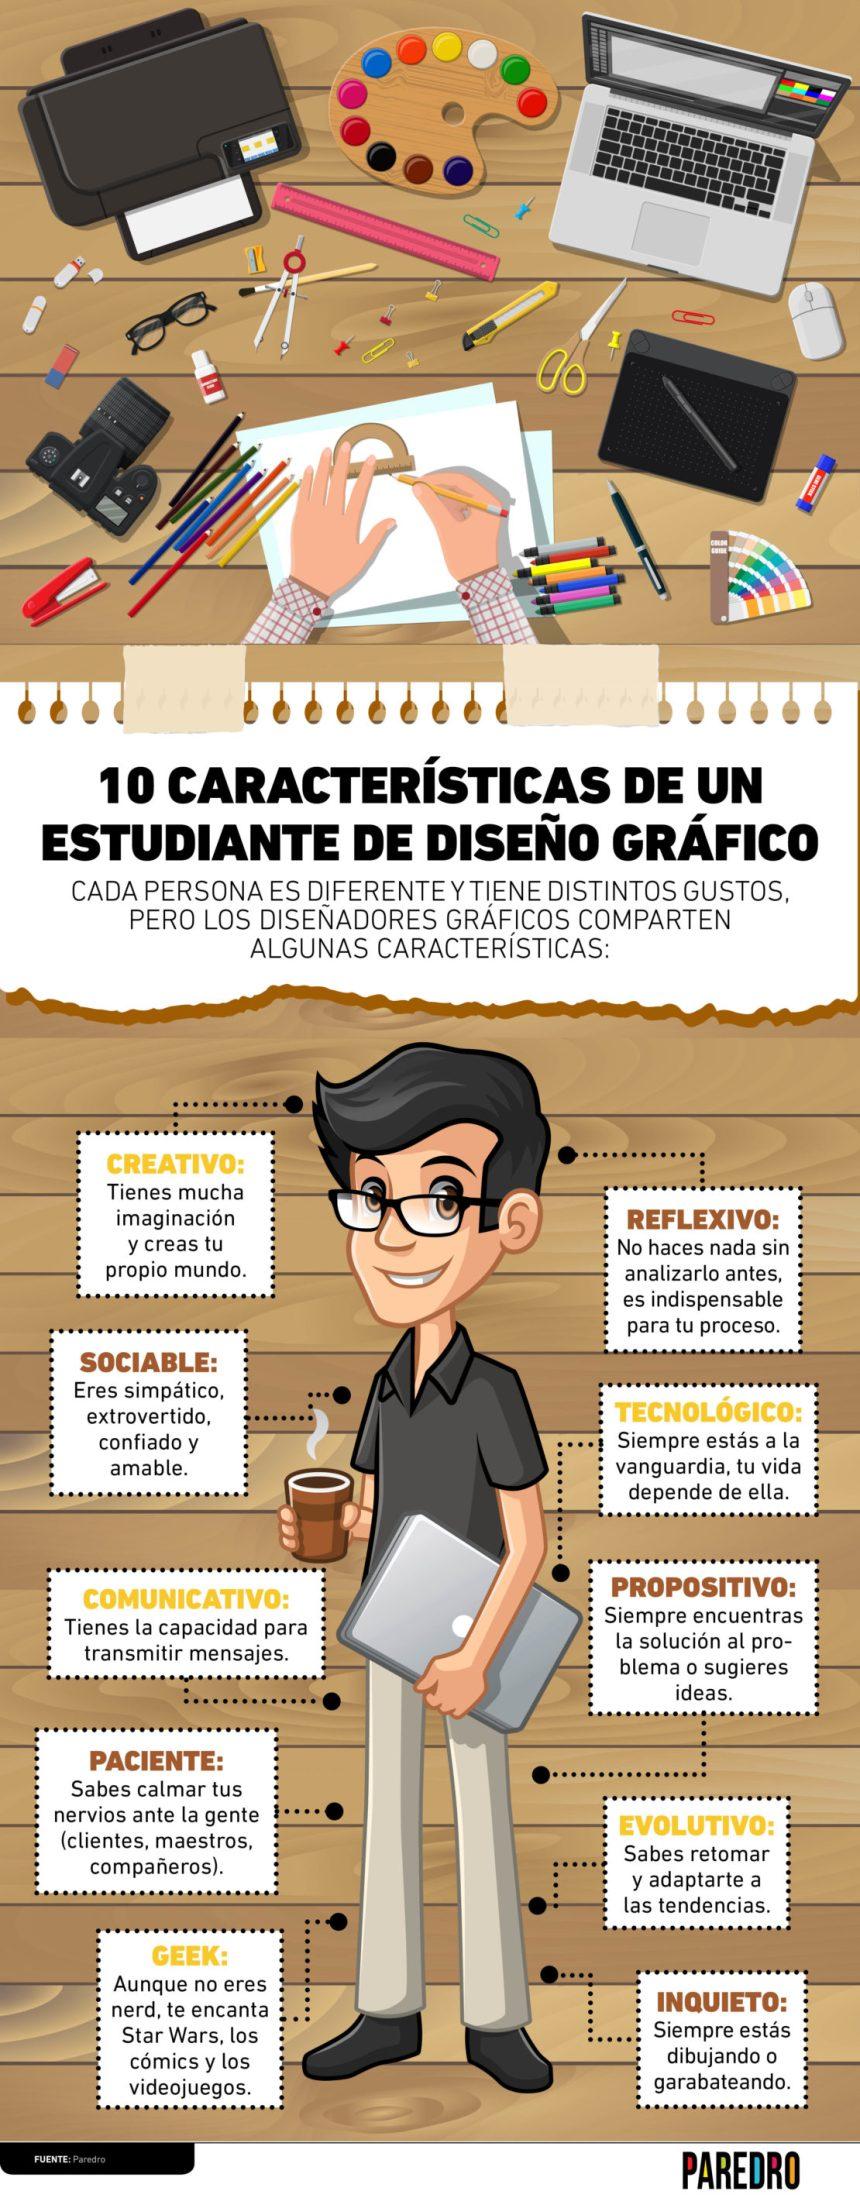 10 características de un estudiante de Diseño Gráfico #infografia #infographic #design